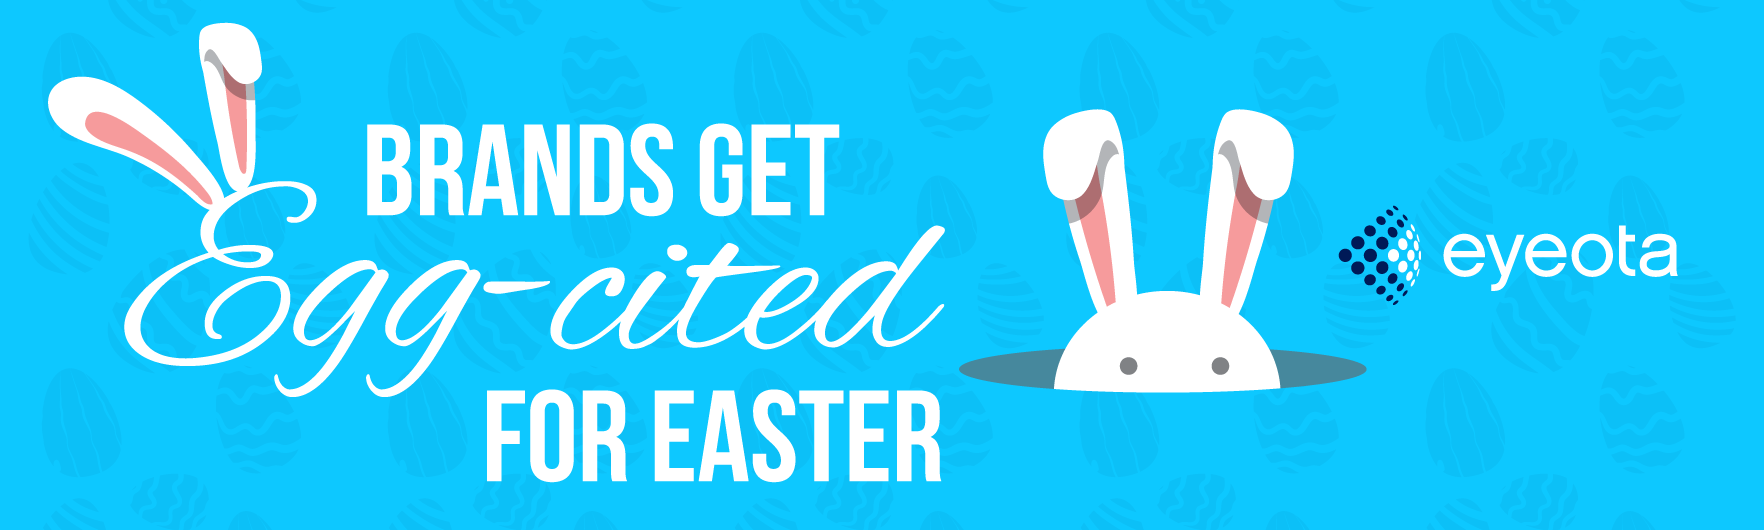 "Eye on Insights: Brands Get ""Egg""-cited for Easter"